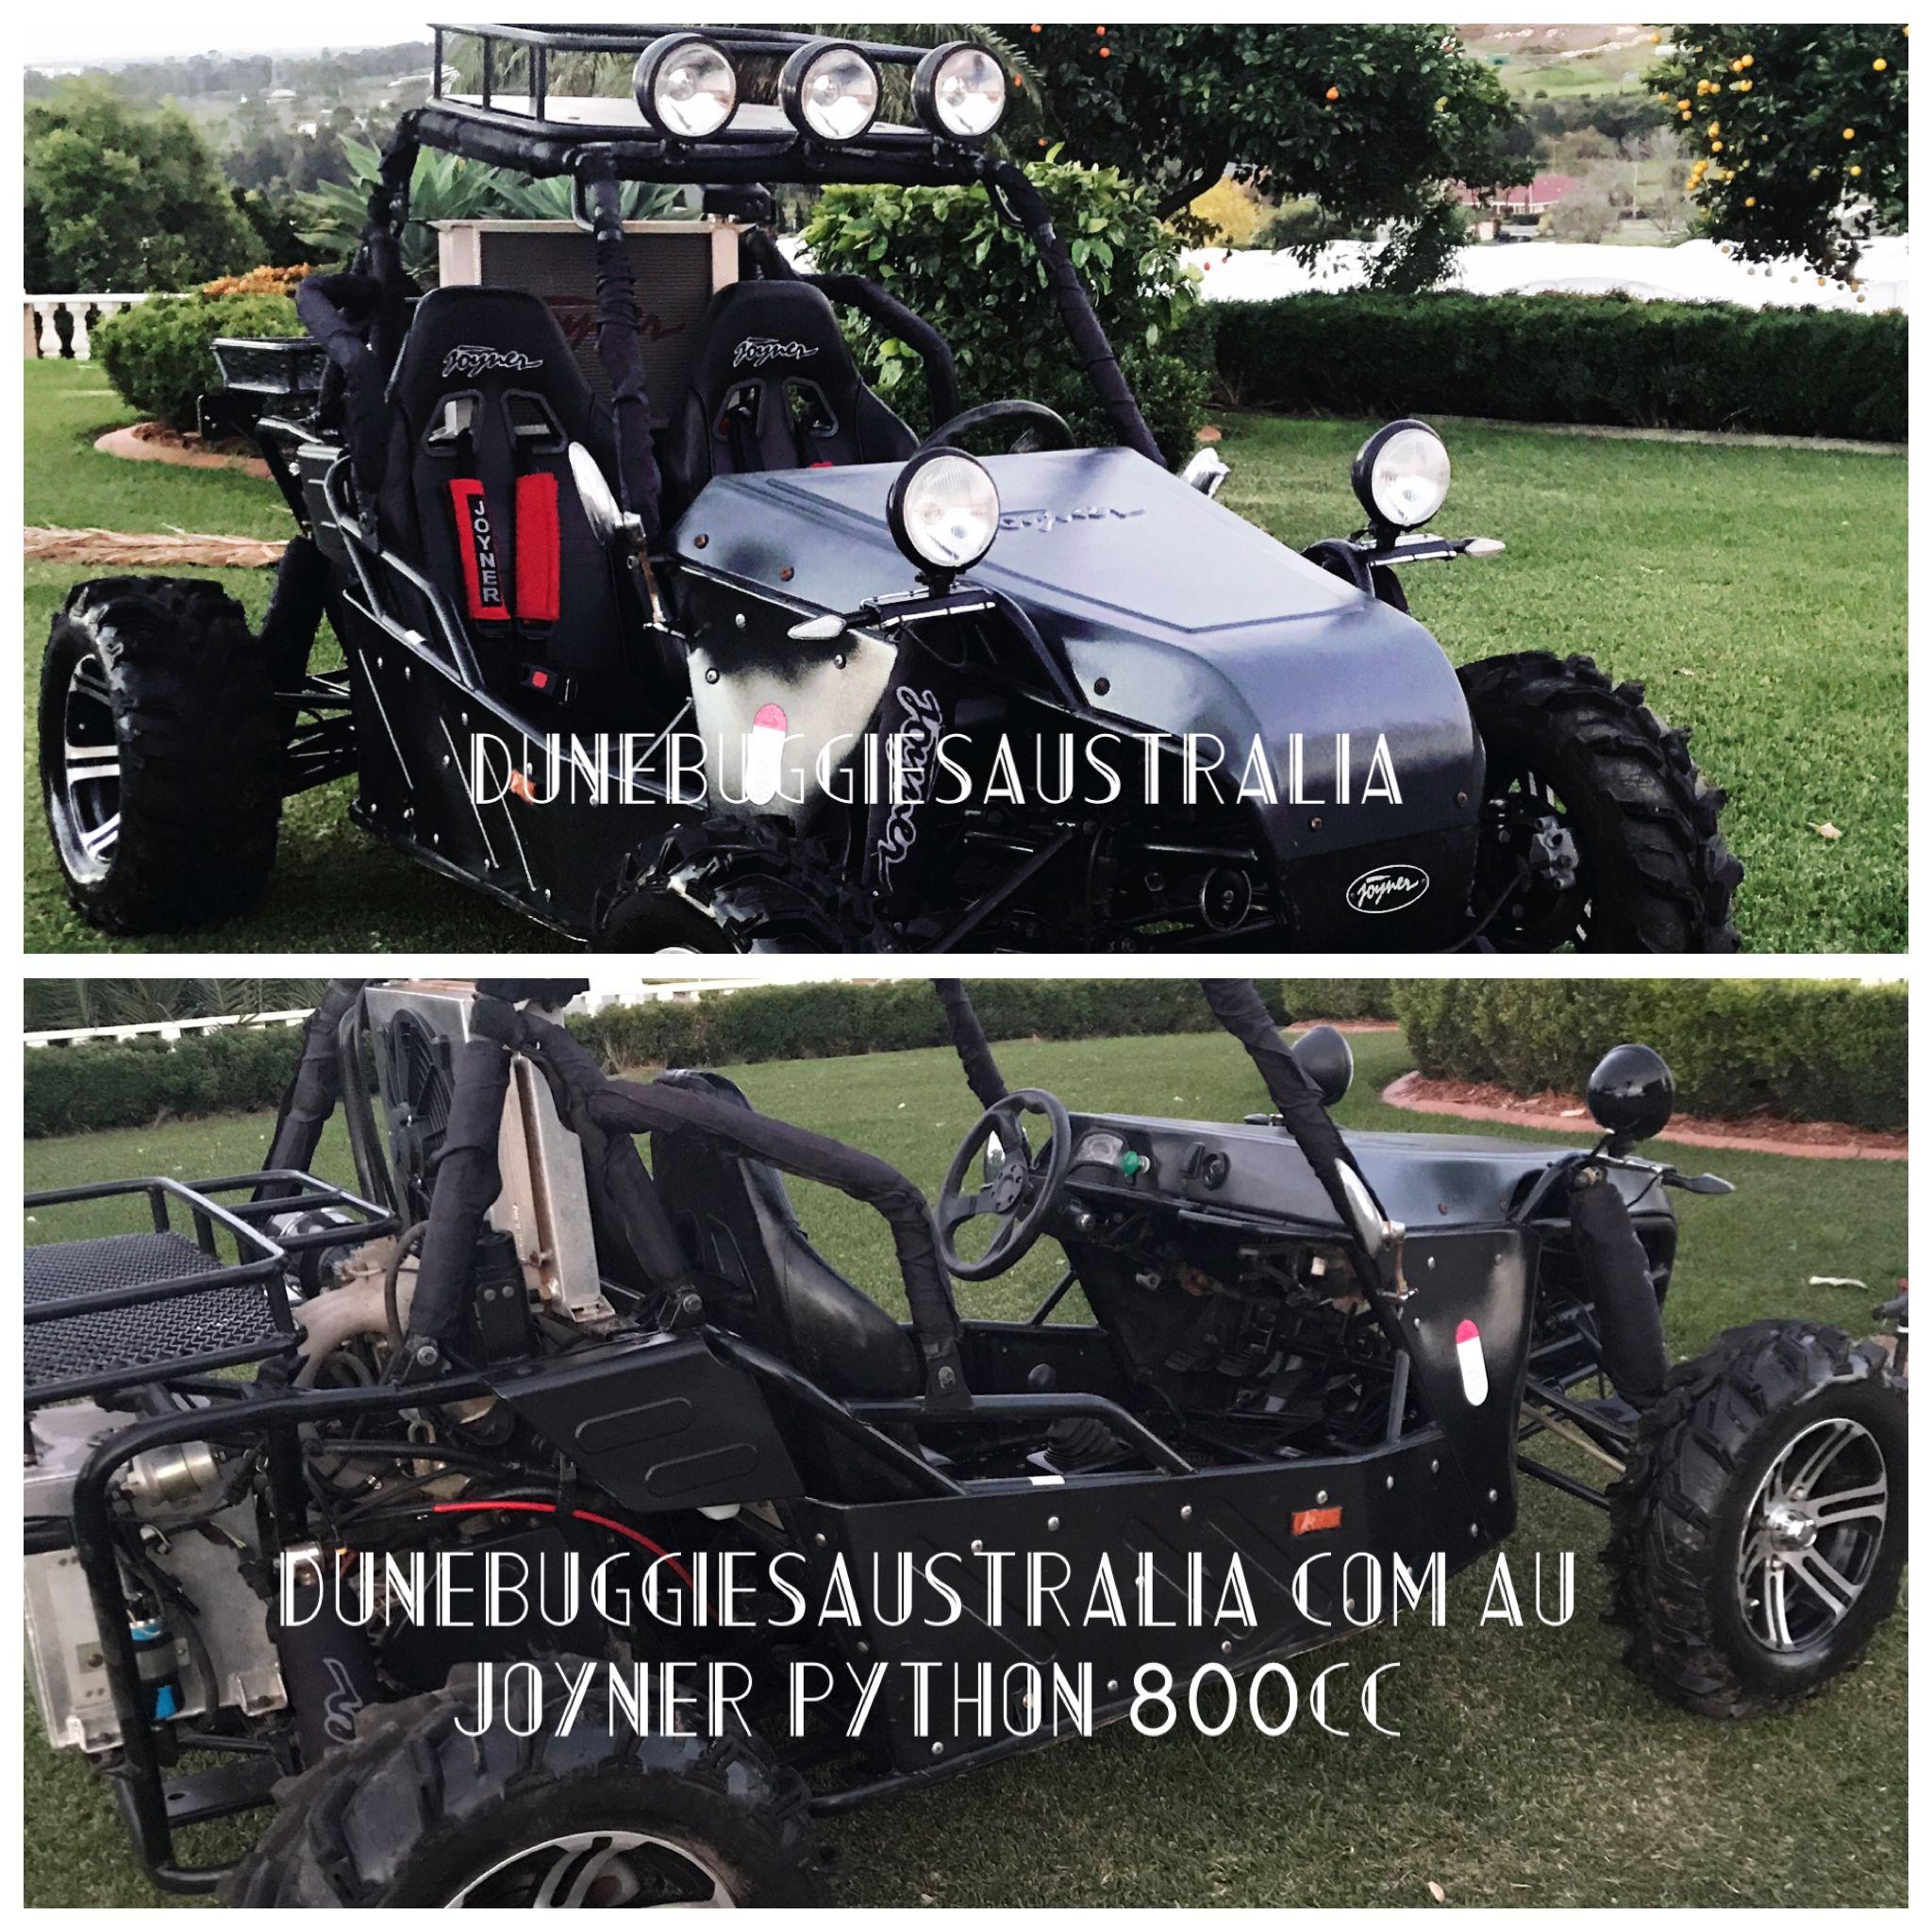 Joyner Python 800cc dune buggy 4 speed manual gearbox , 14